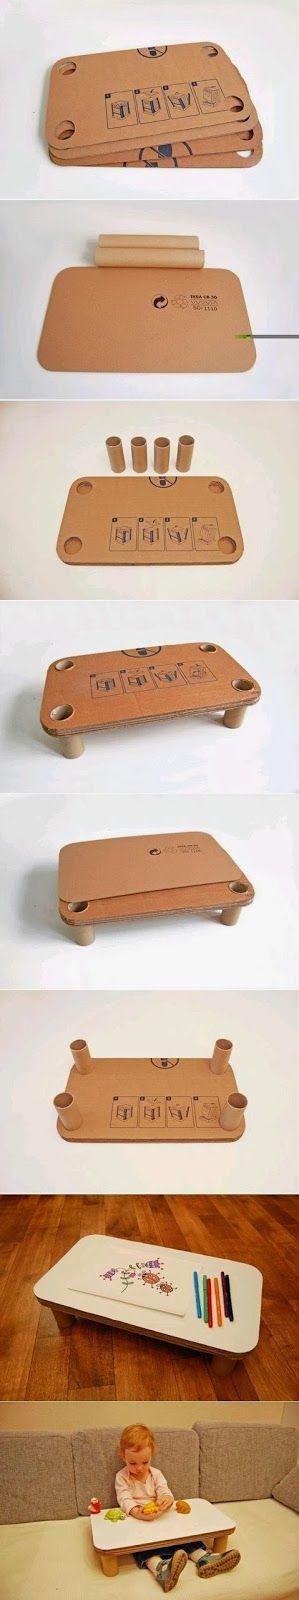 Diy Make a Children Cardboard Table